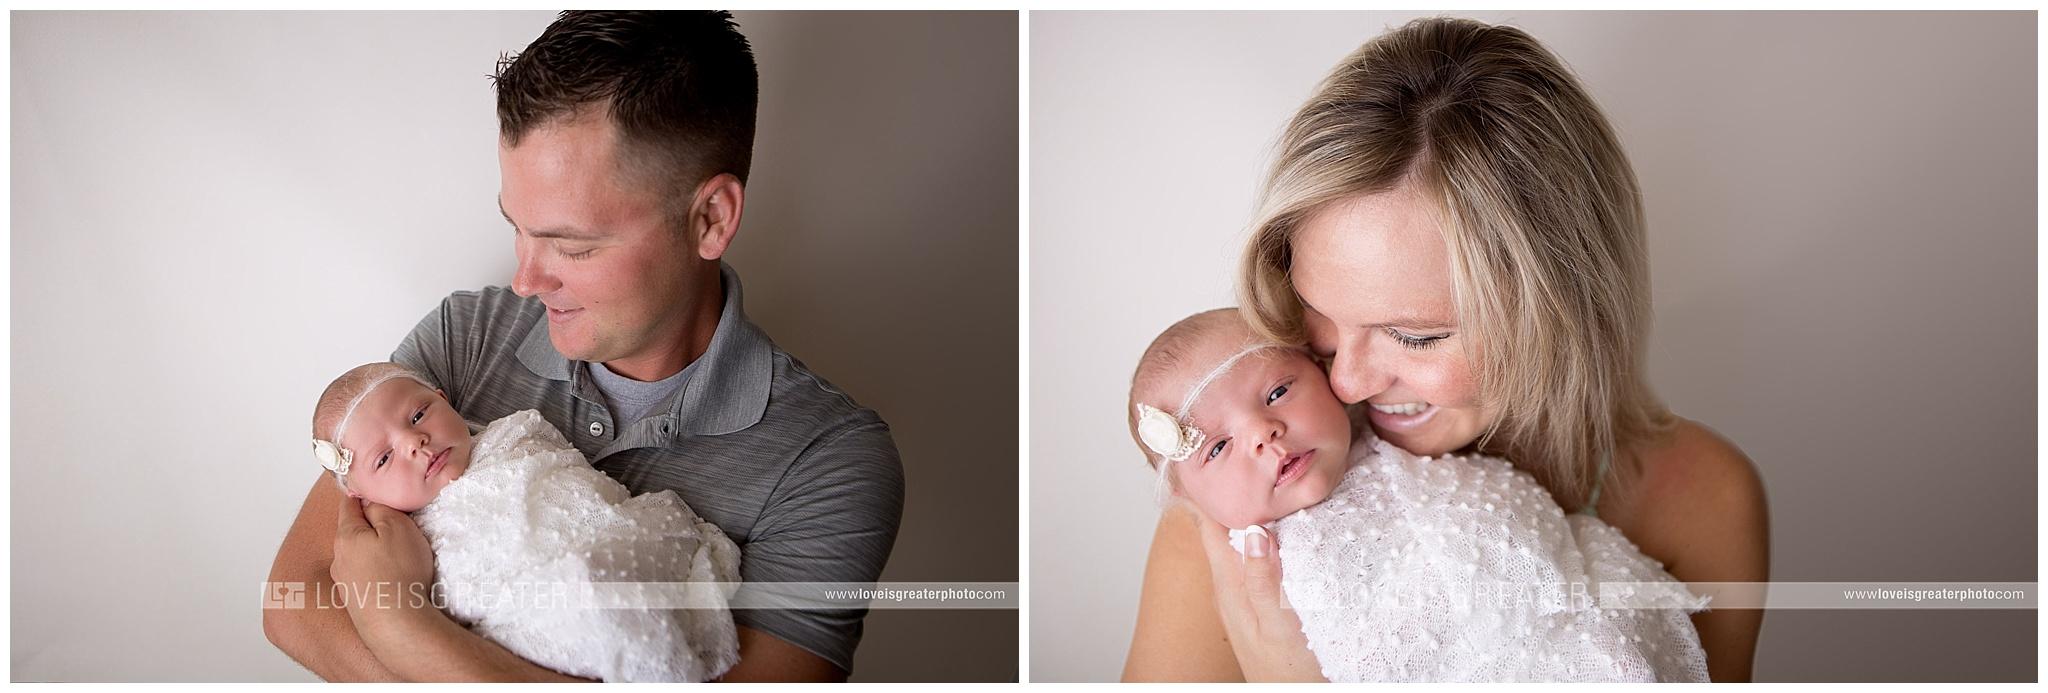 toledo-newborn-photographer_0001